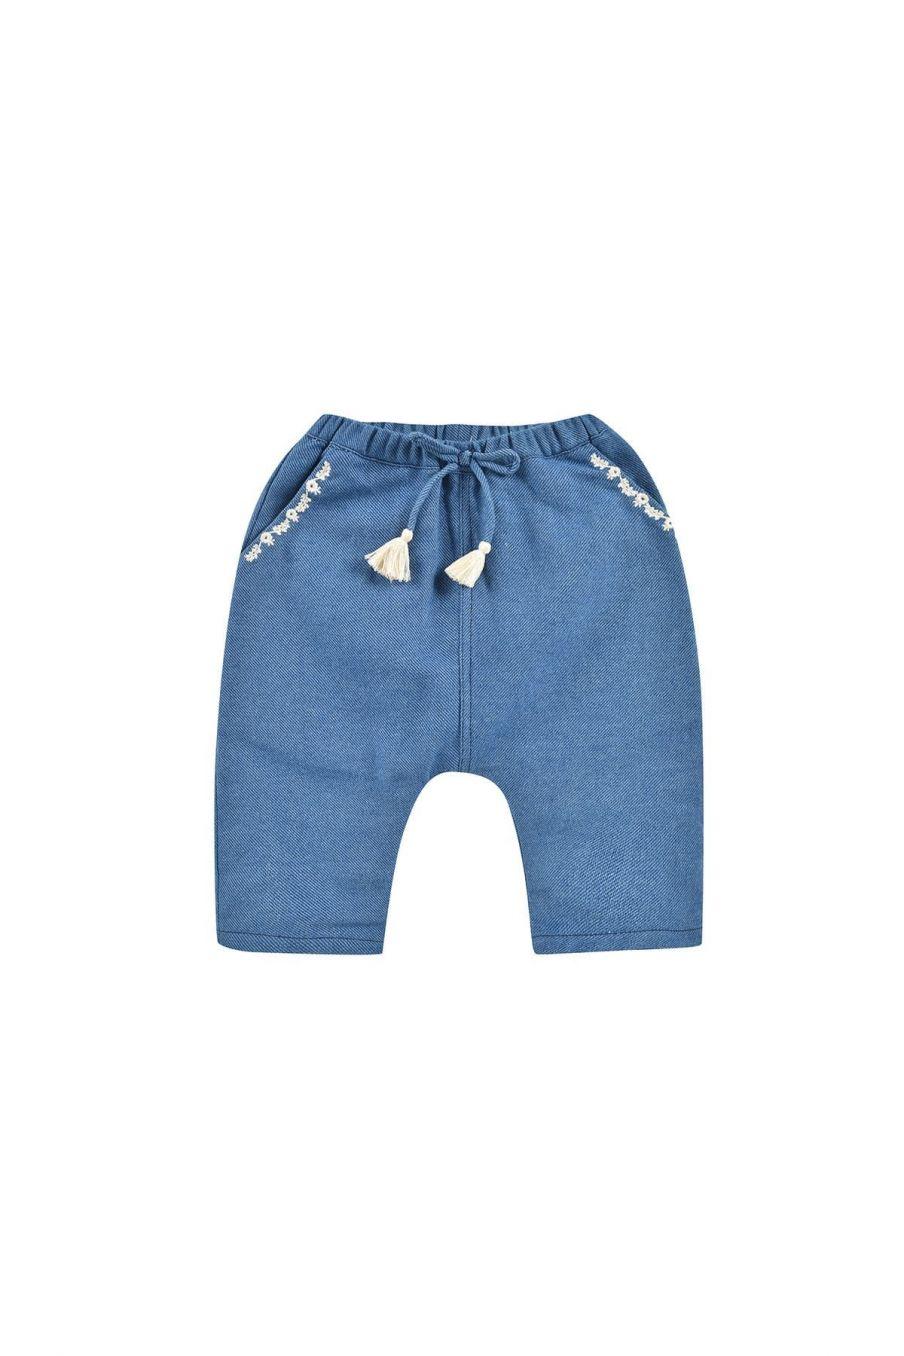 pantalon bebe fille flor blue denim - louise misha